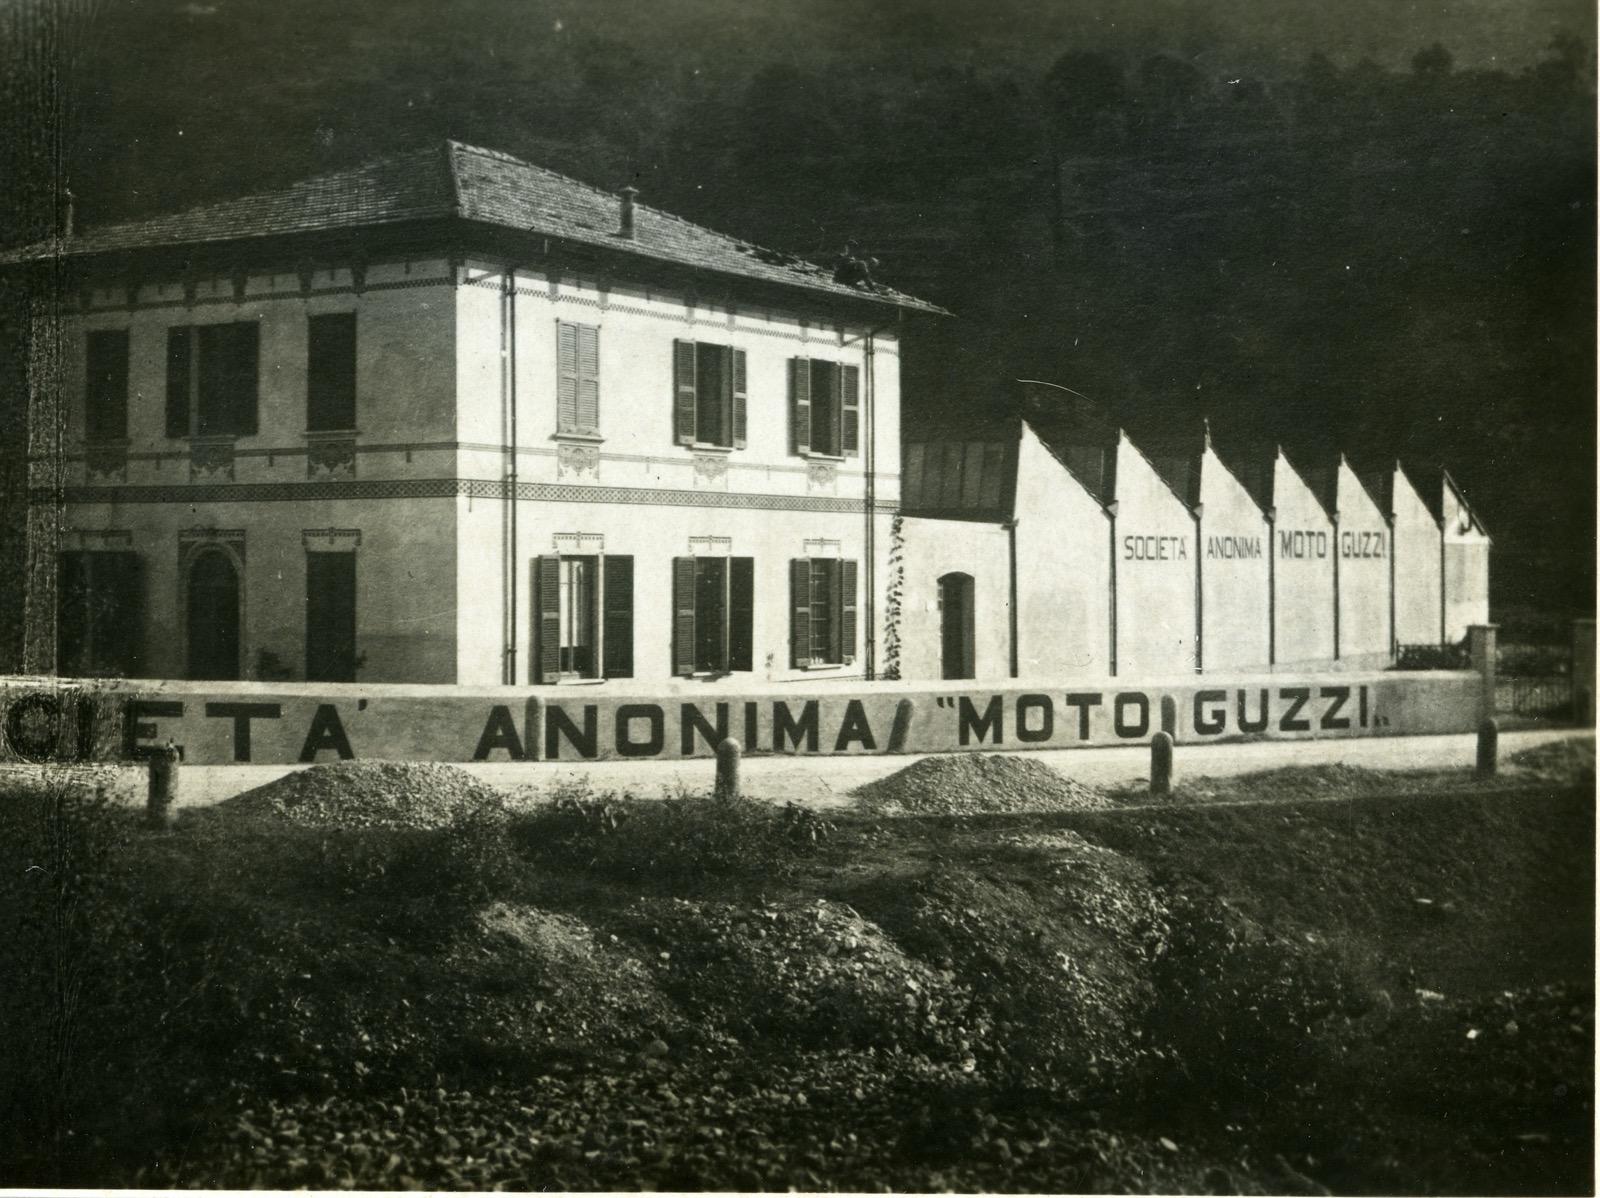 moto guzzi lake como italy